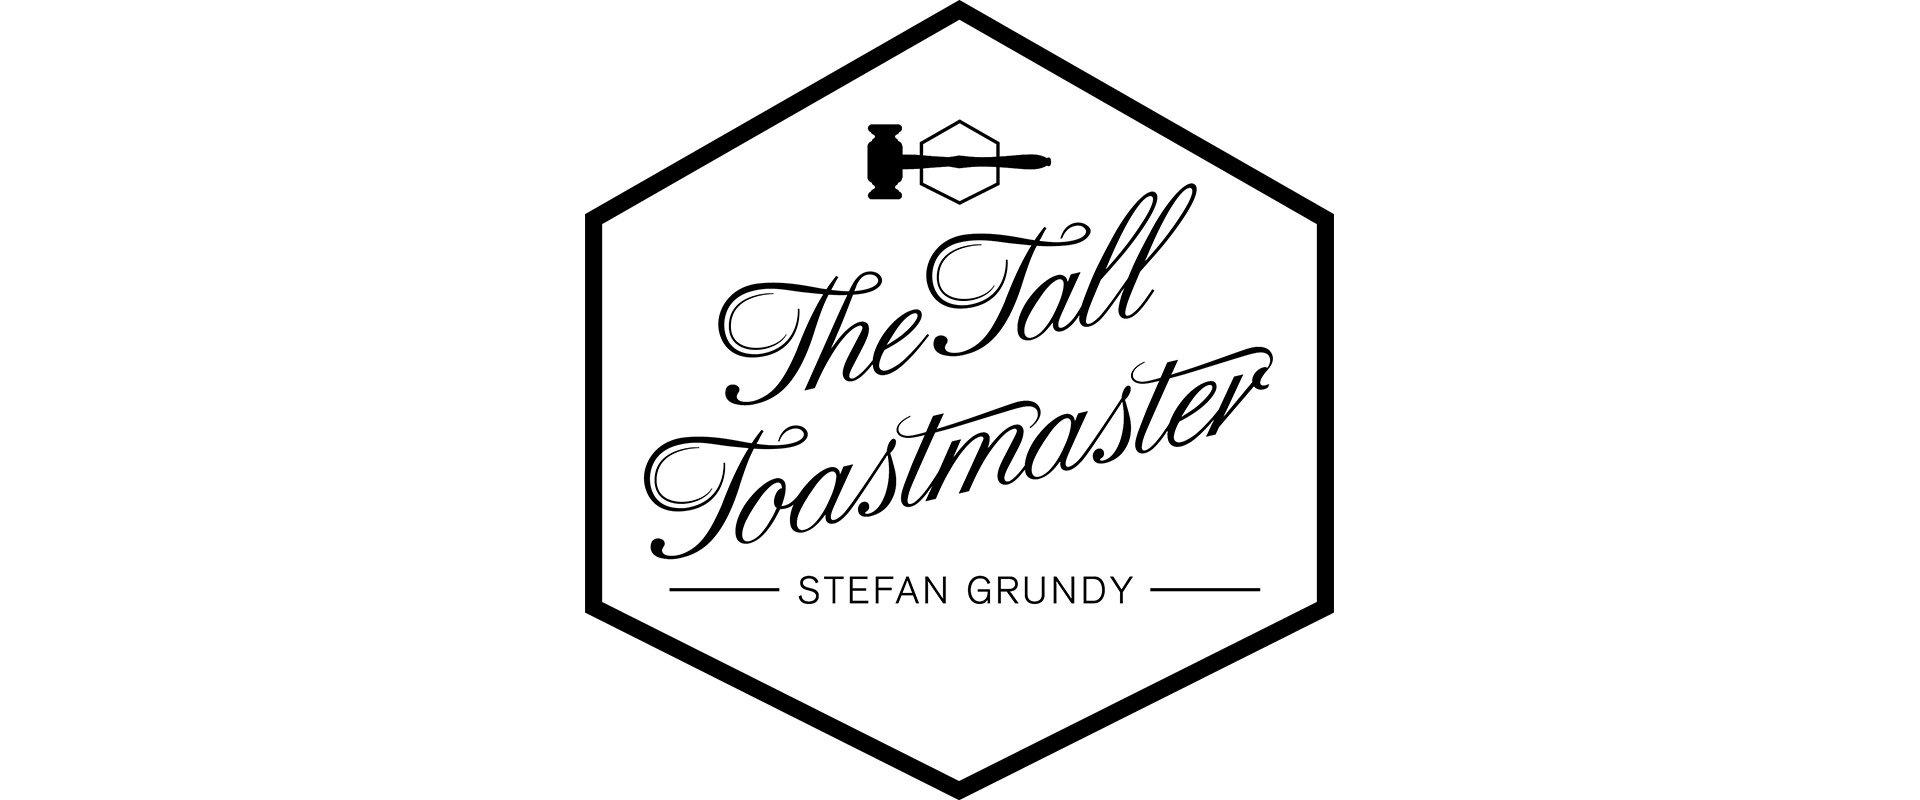 The Tall Toastmaster Logo